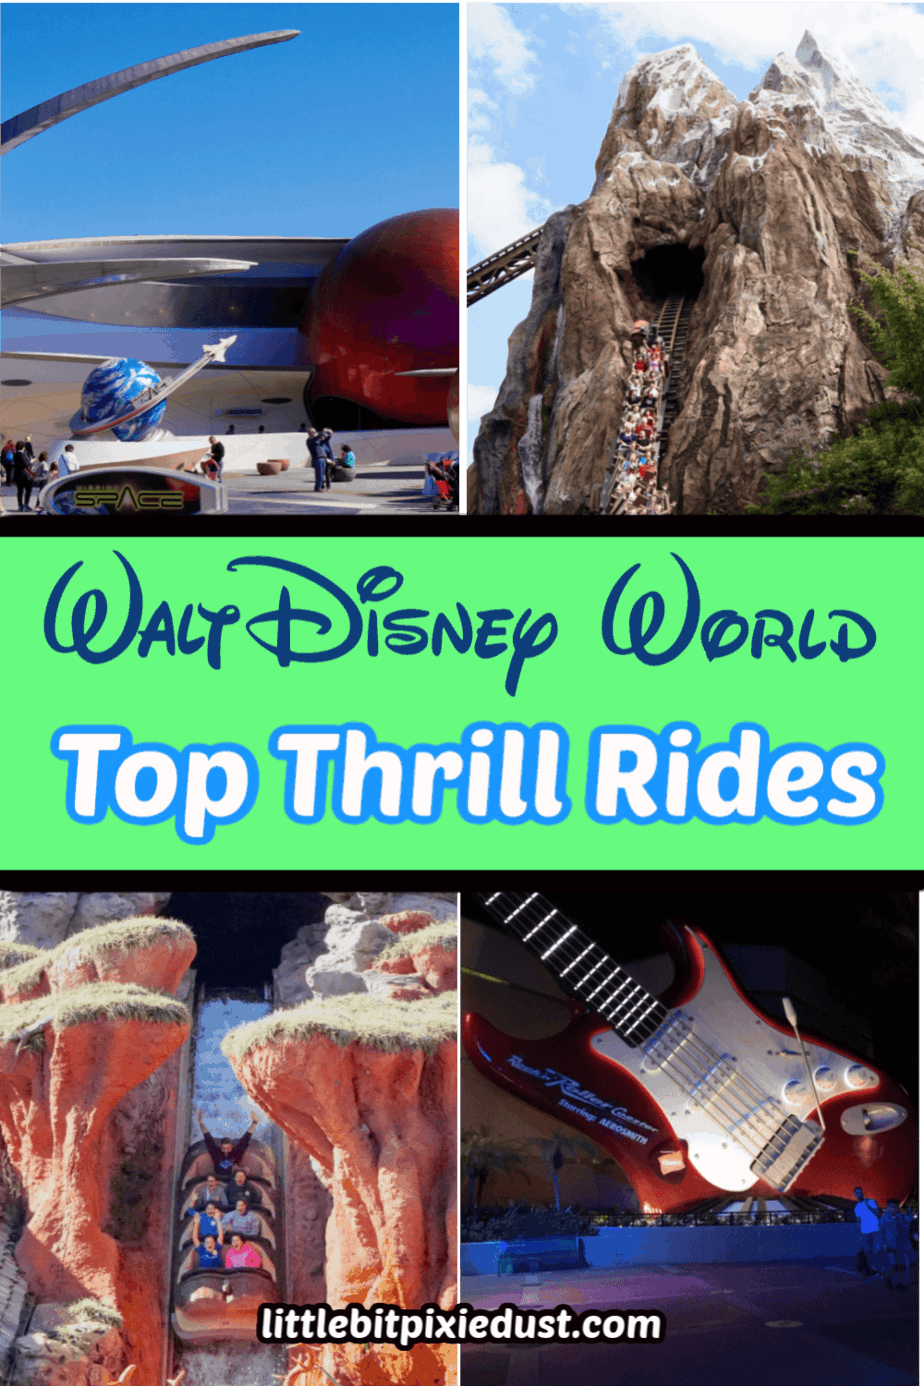 Disney World Thrill Rides